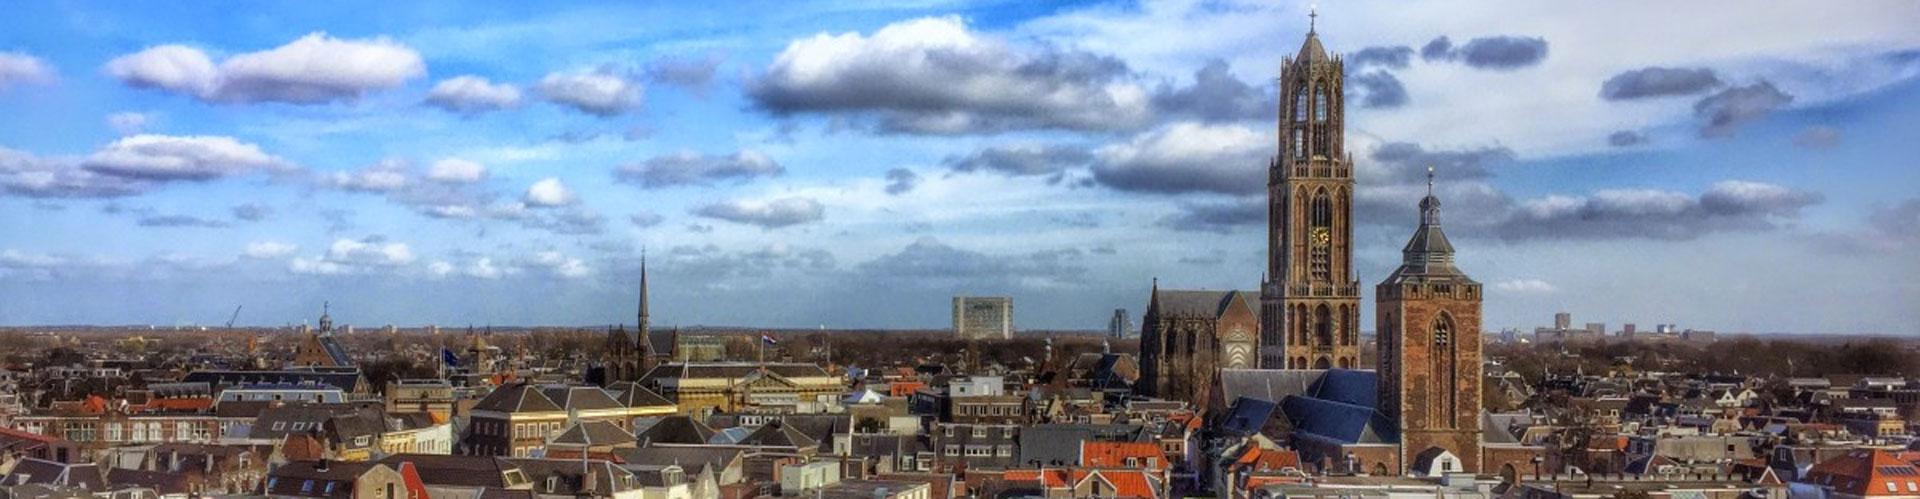 Letselschade Utrecht advocaat inschakelen